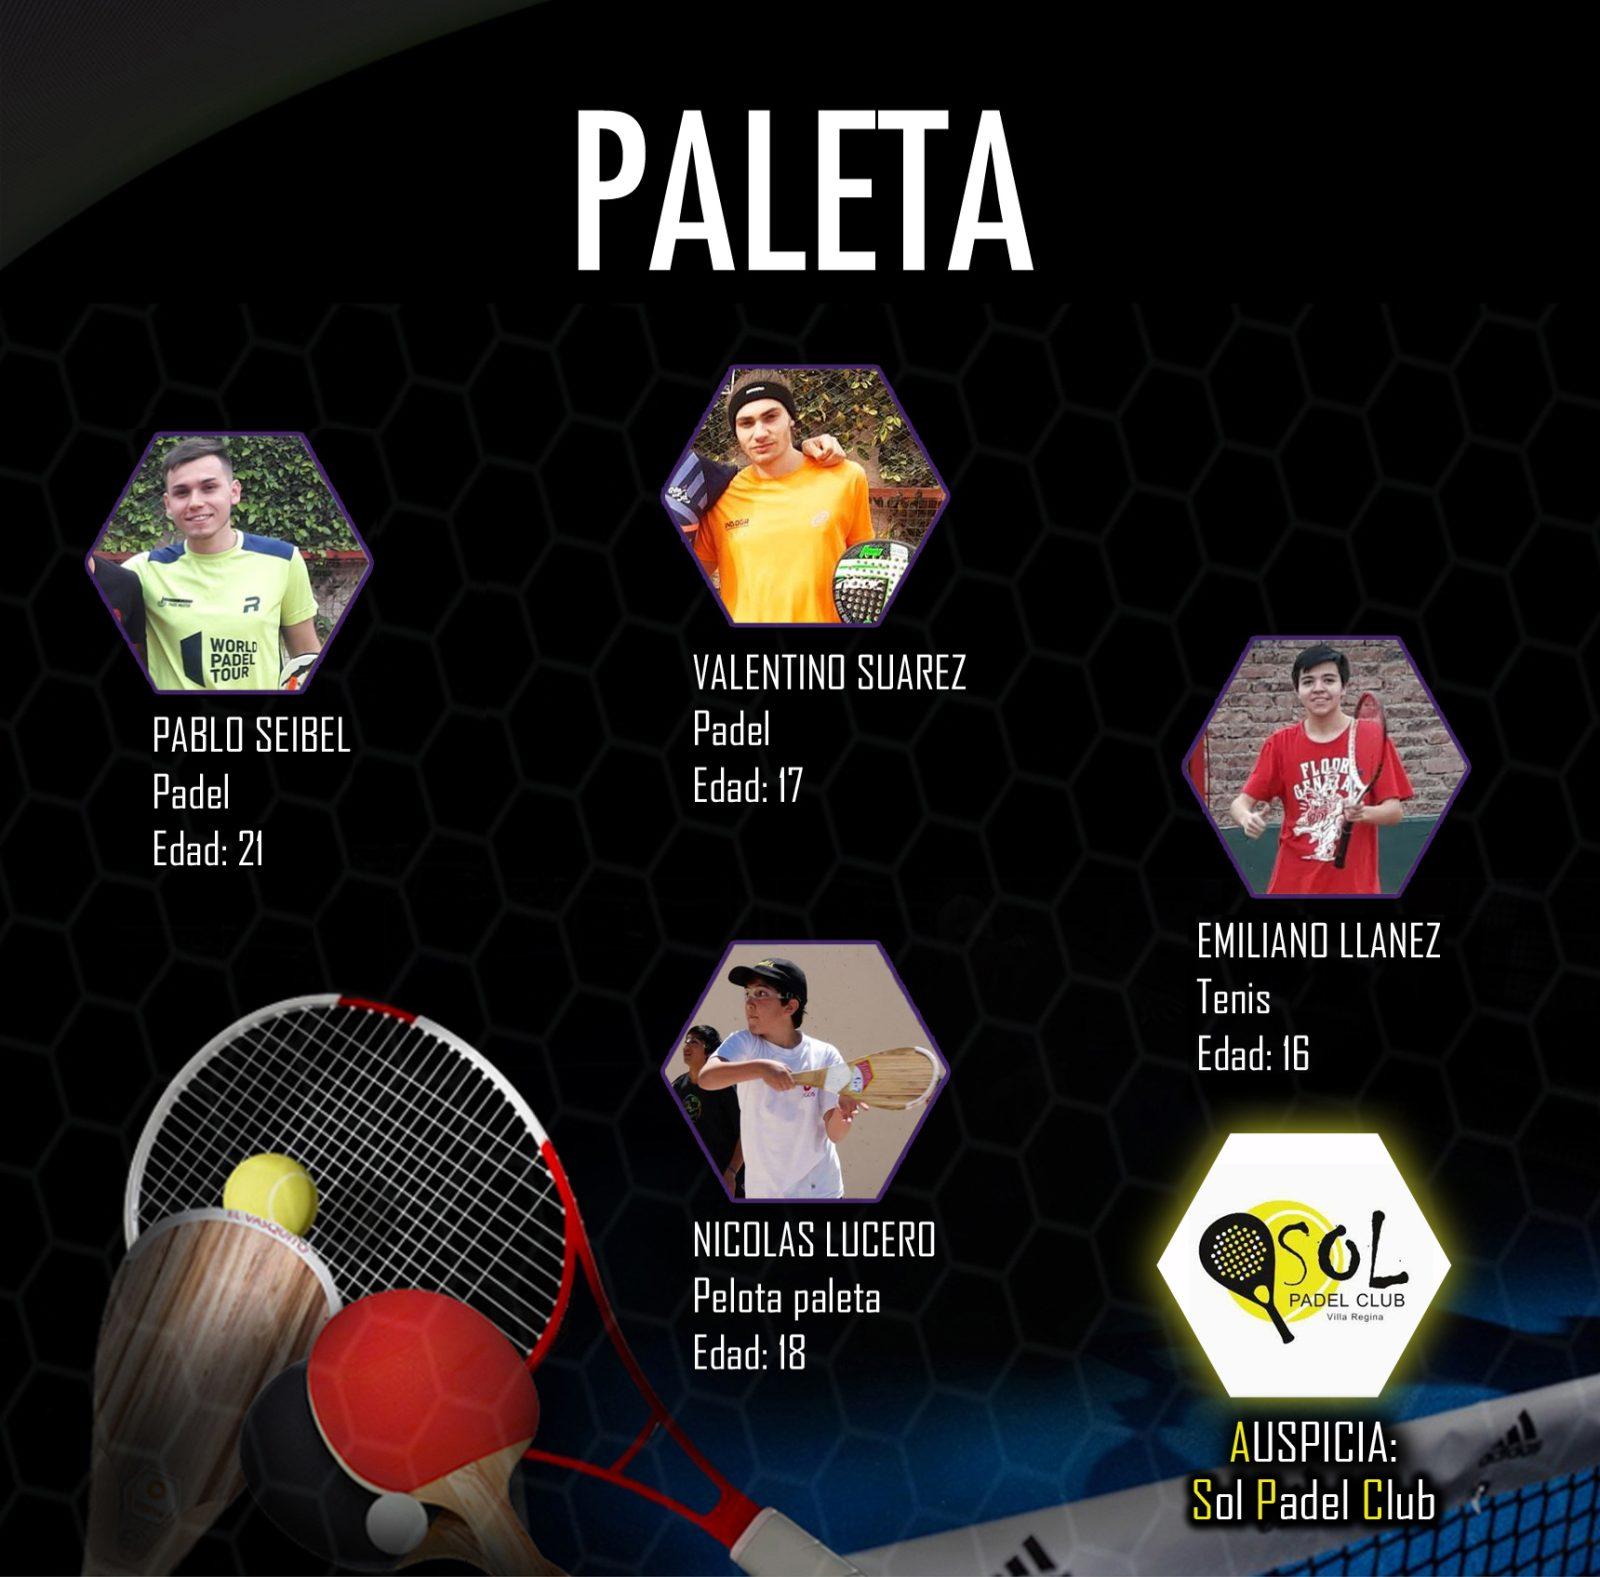 PREMIOS DEPORTIVOS E-TAPAS 2019/DEPORTES DE PALETA